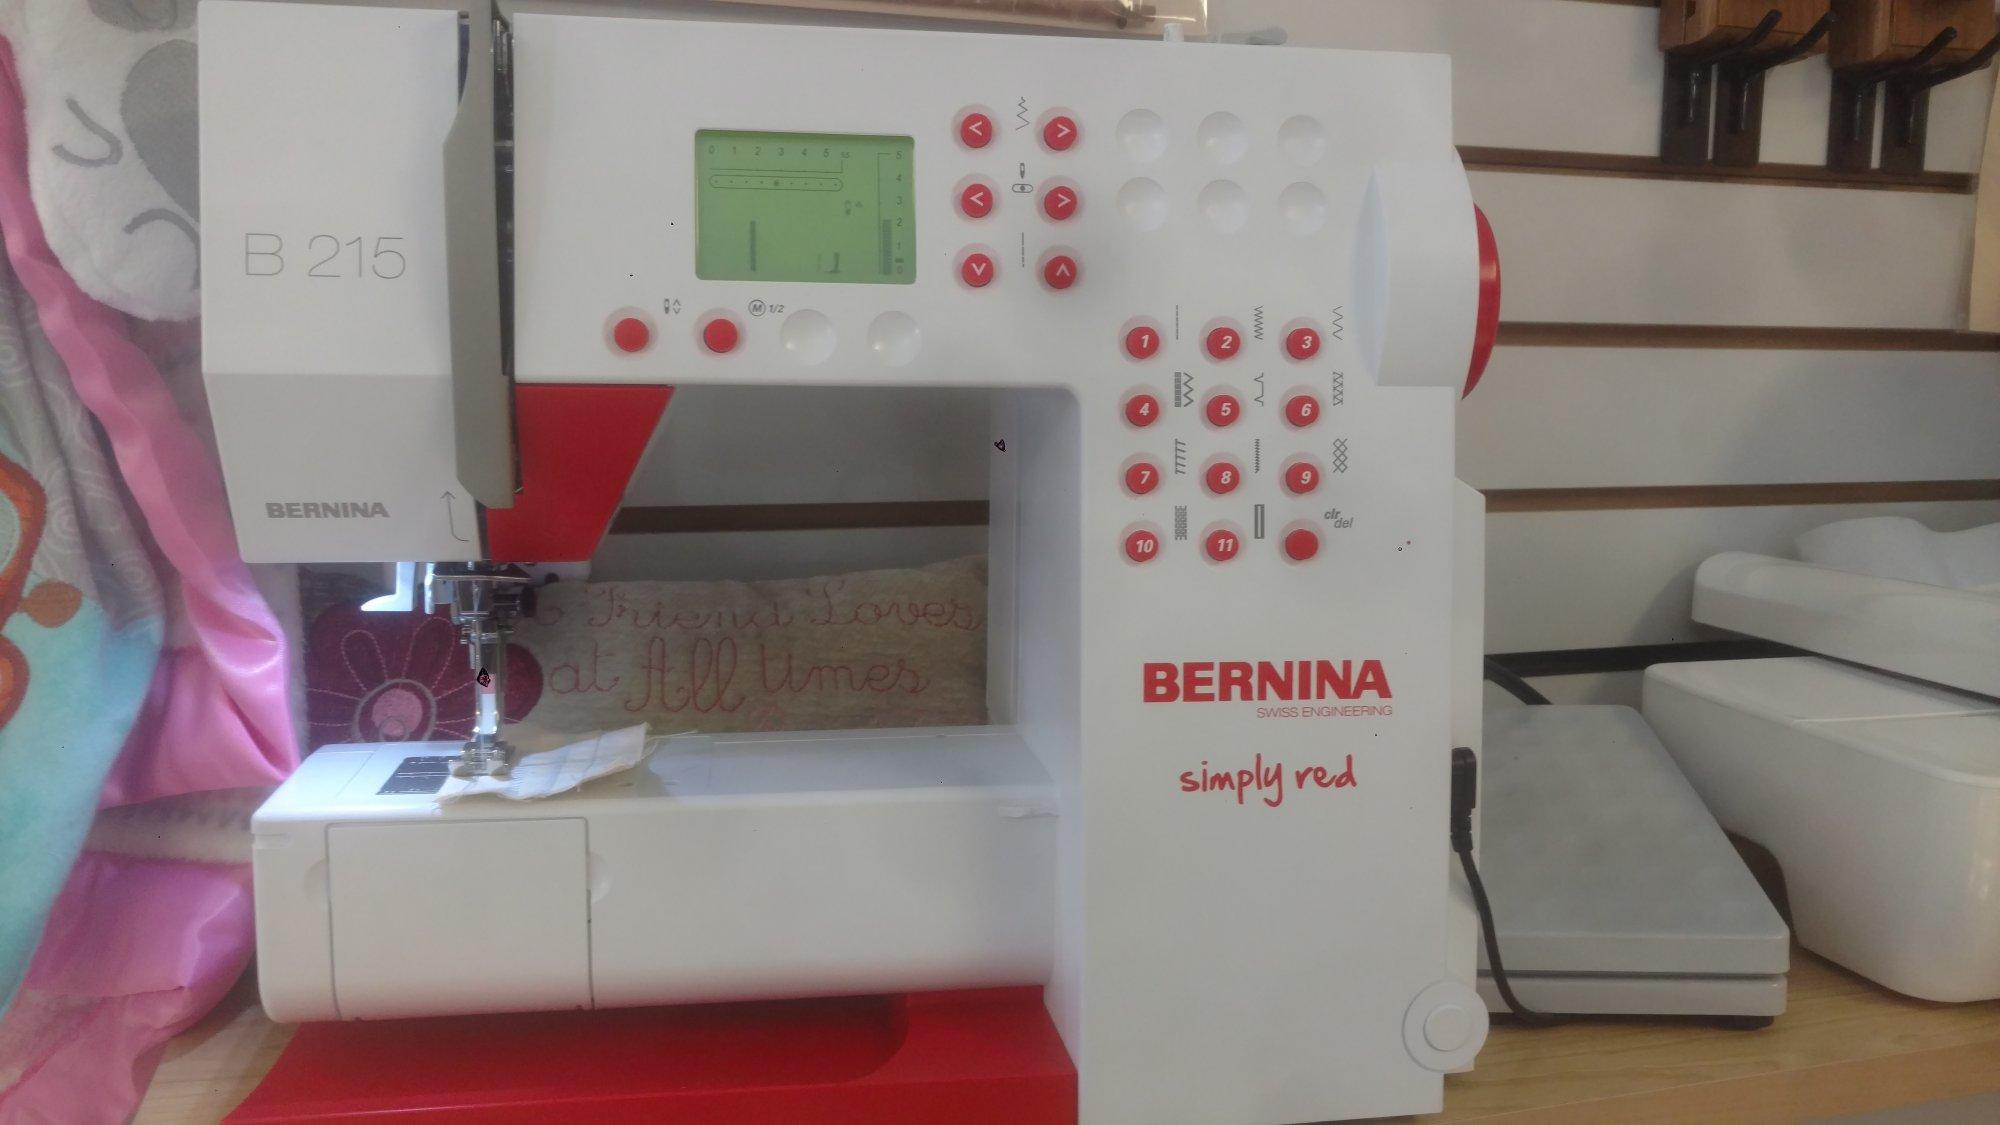 Bernina 215 lightly used